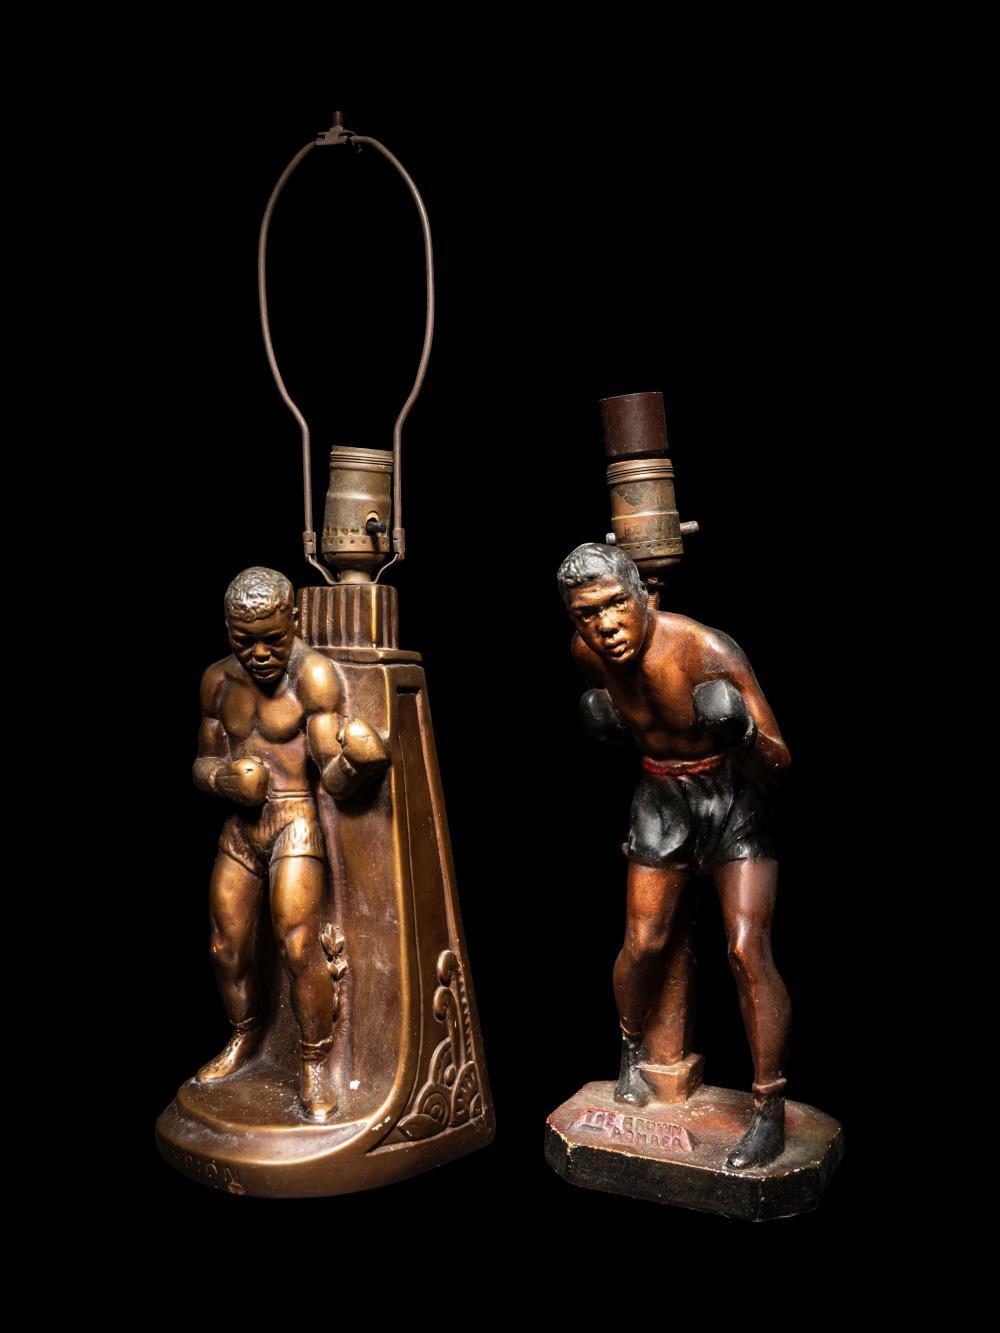 A Group of Two Vintage Joe Louis Figural Lamps,